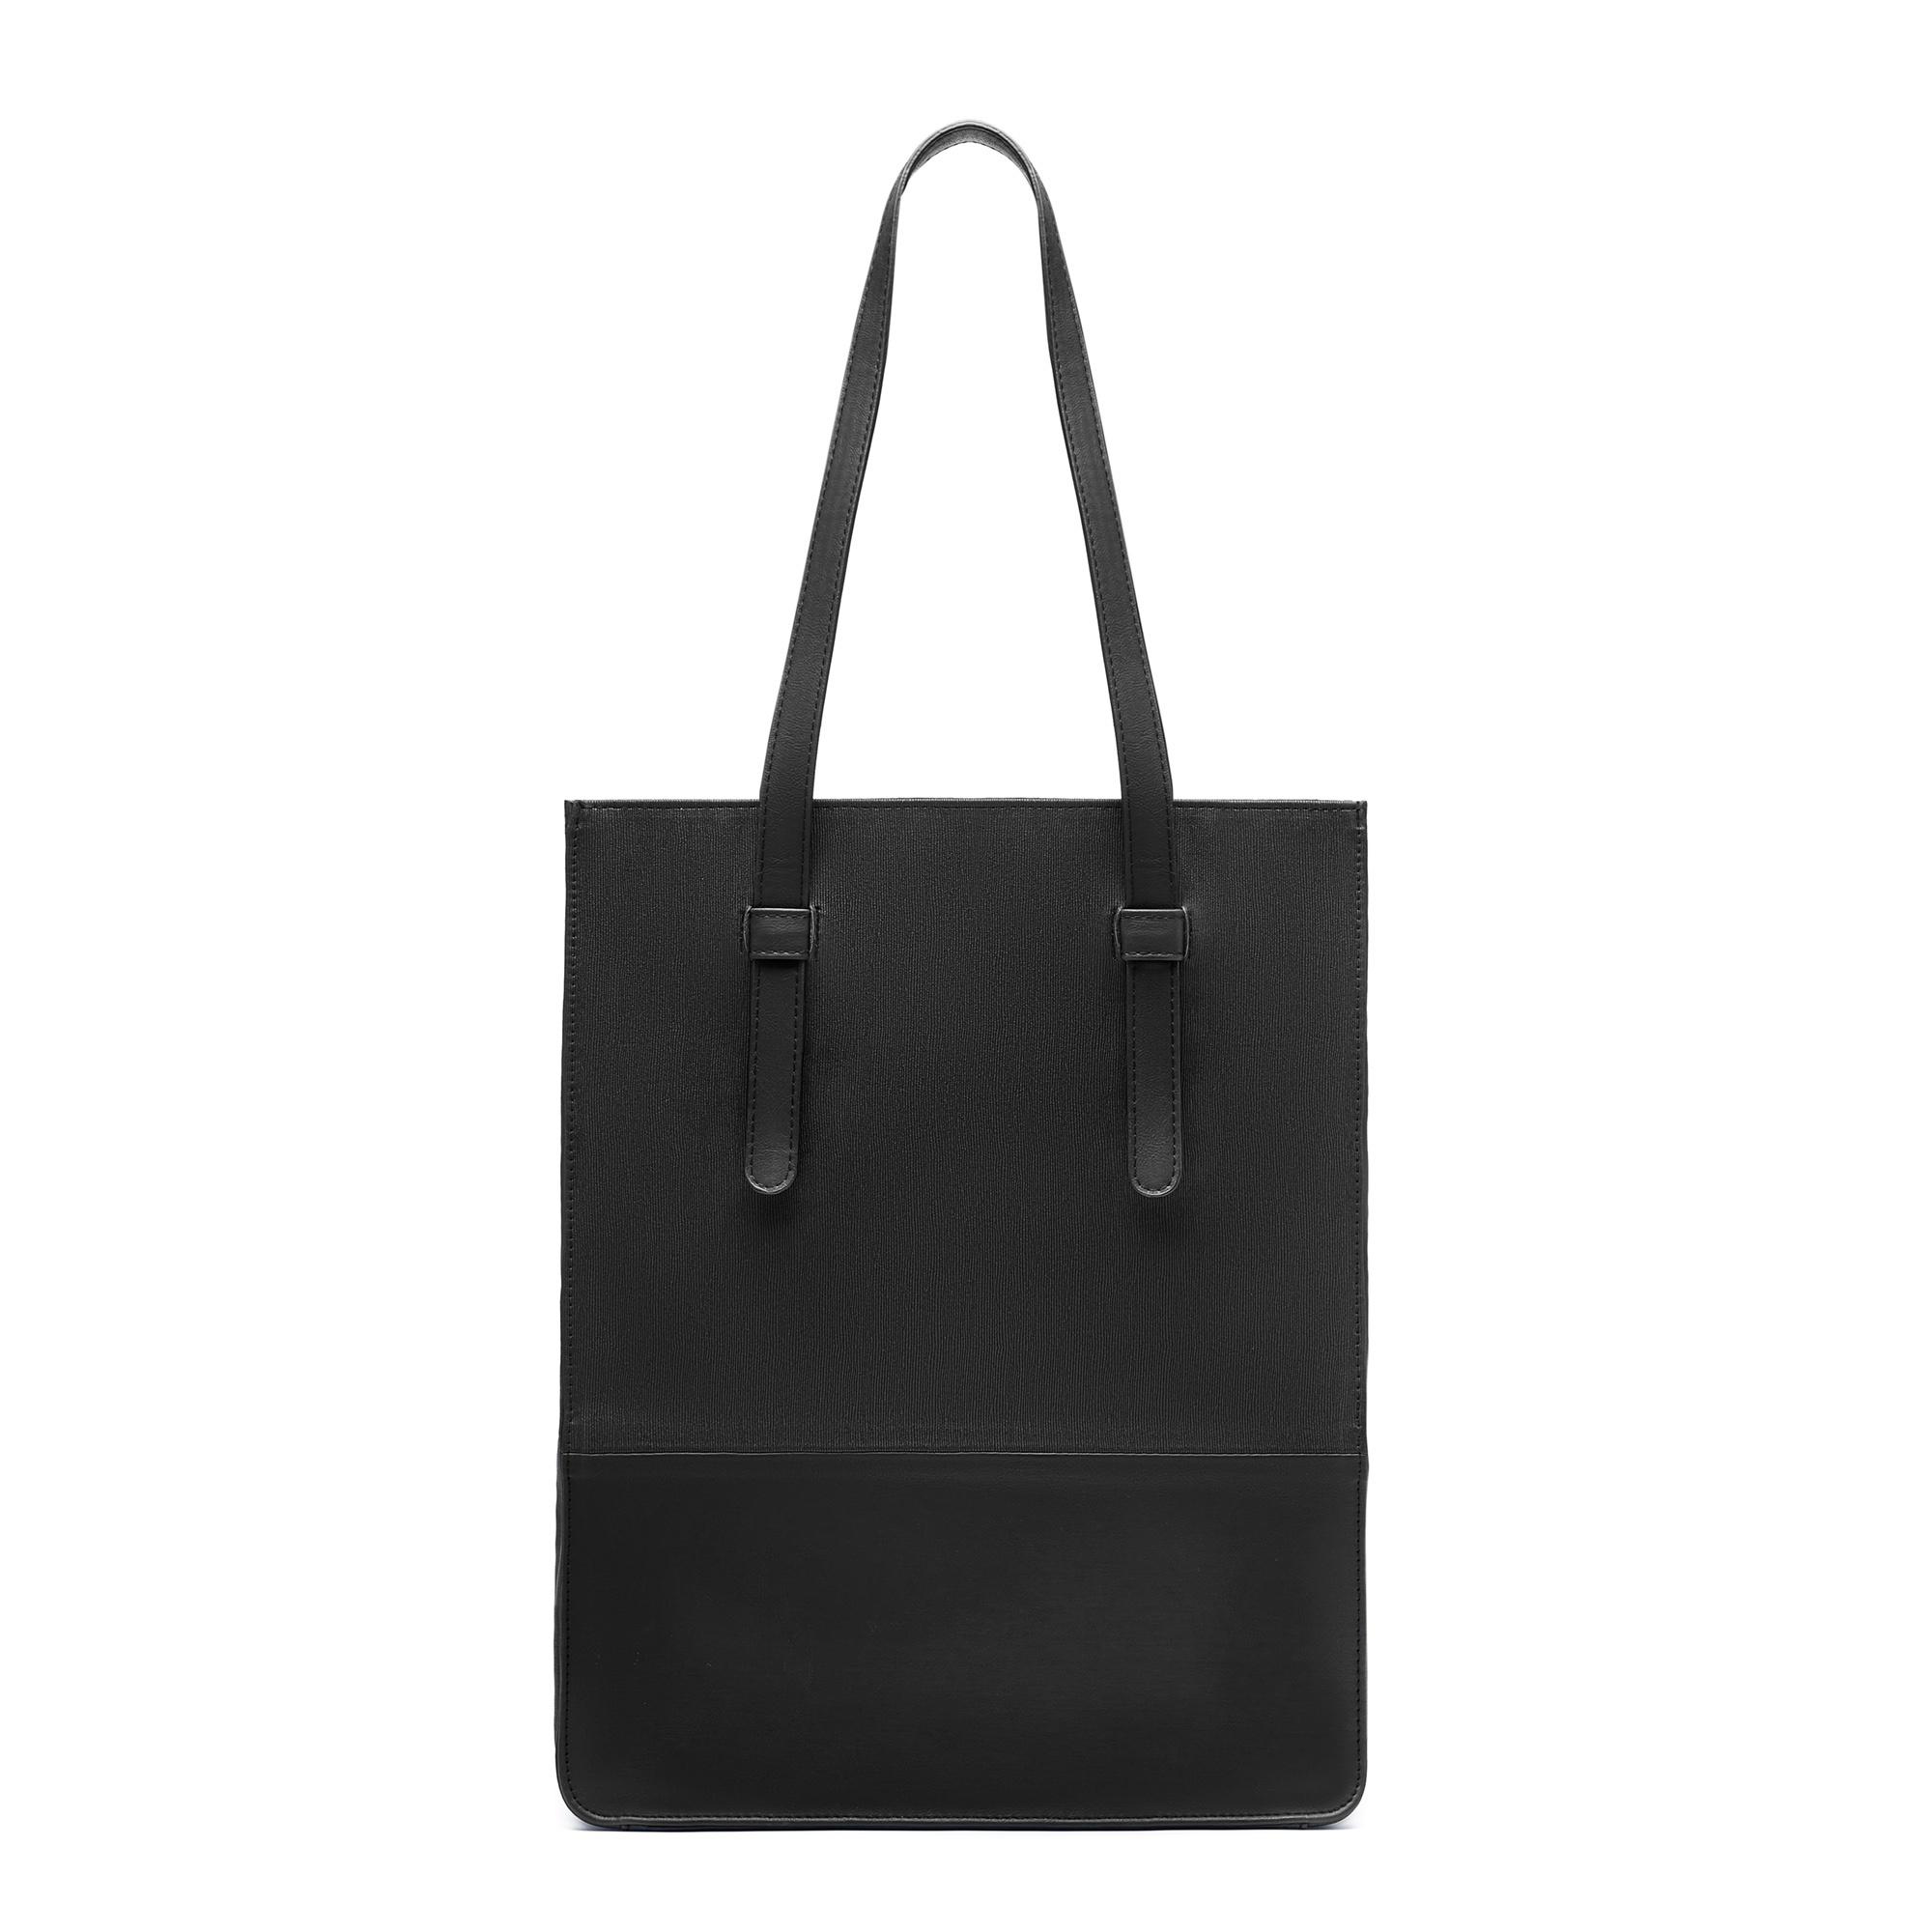 Violet Hamden The Essential Bag sac d'épaule Minuit Noir